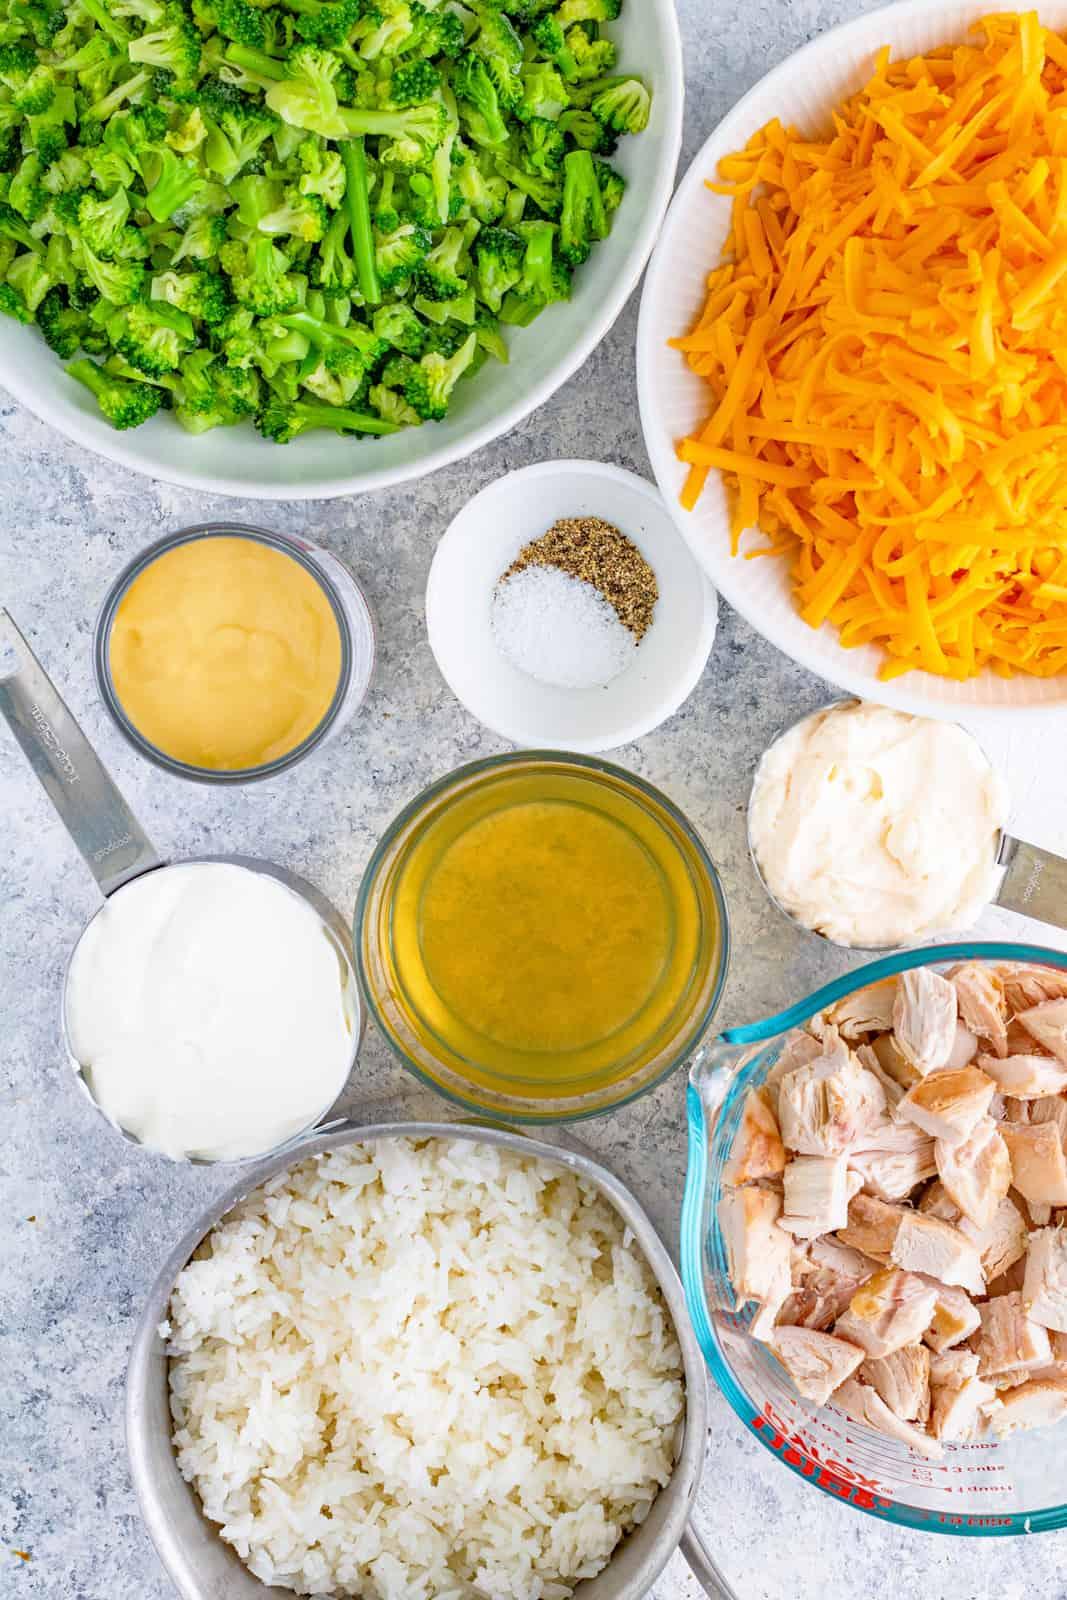 Ingredients needed to make Chicken Broccoli Rice Casserole.